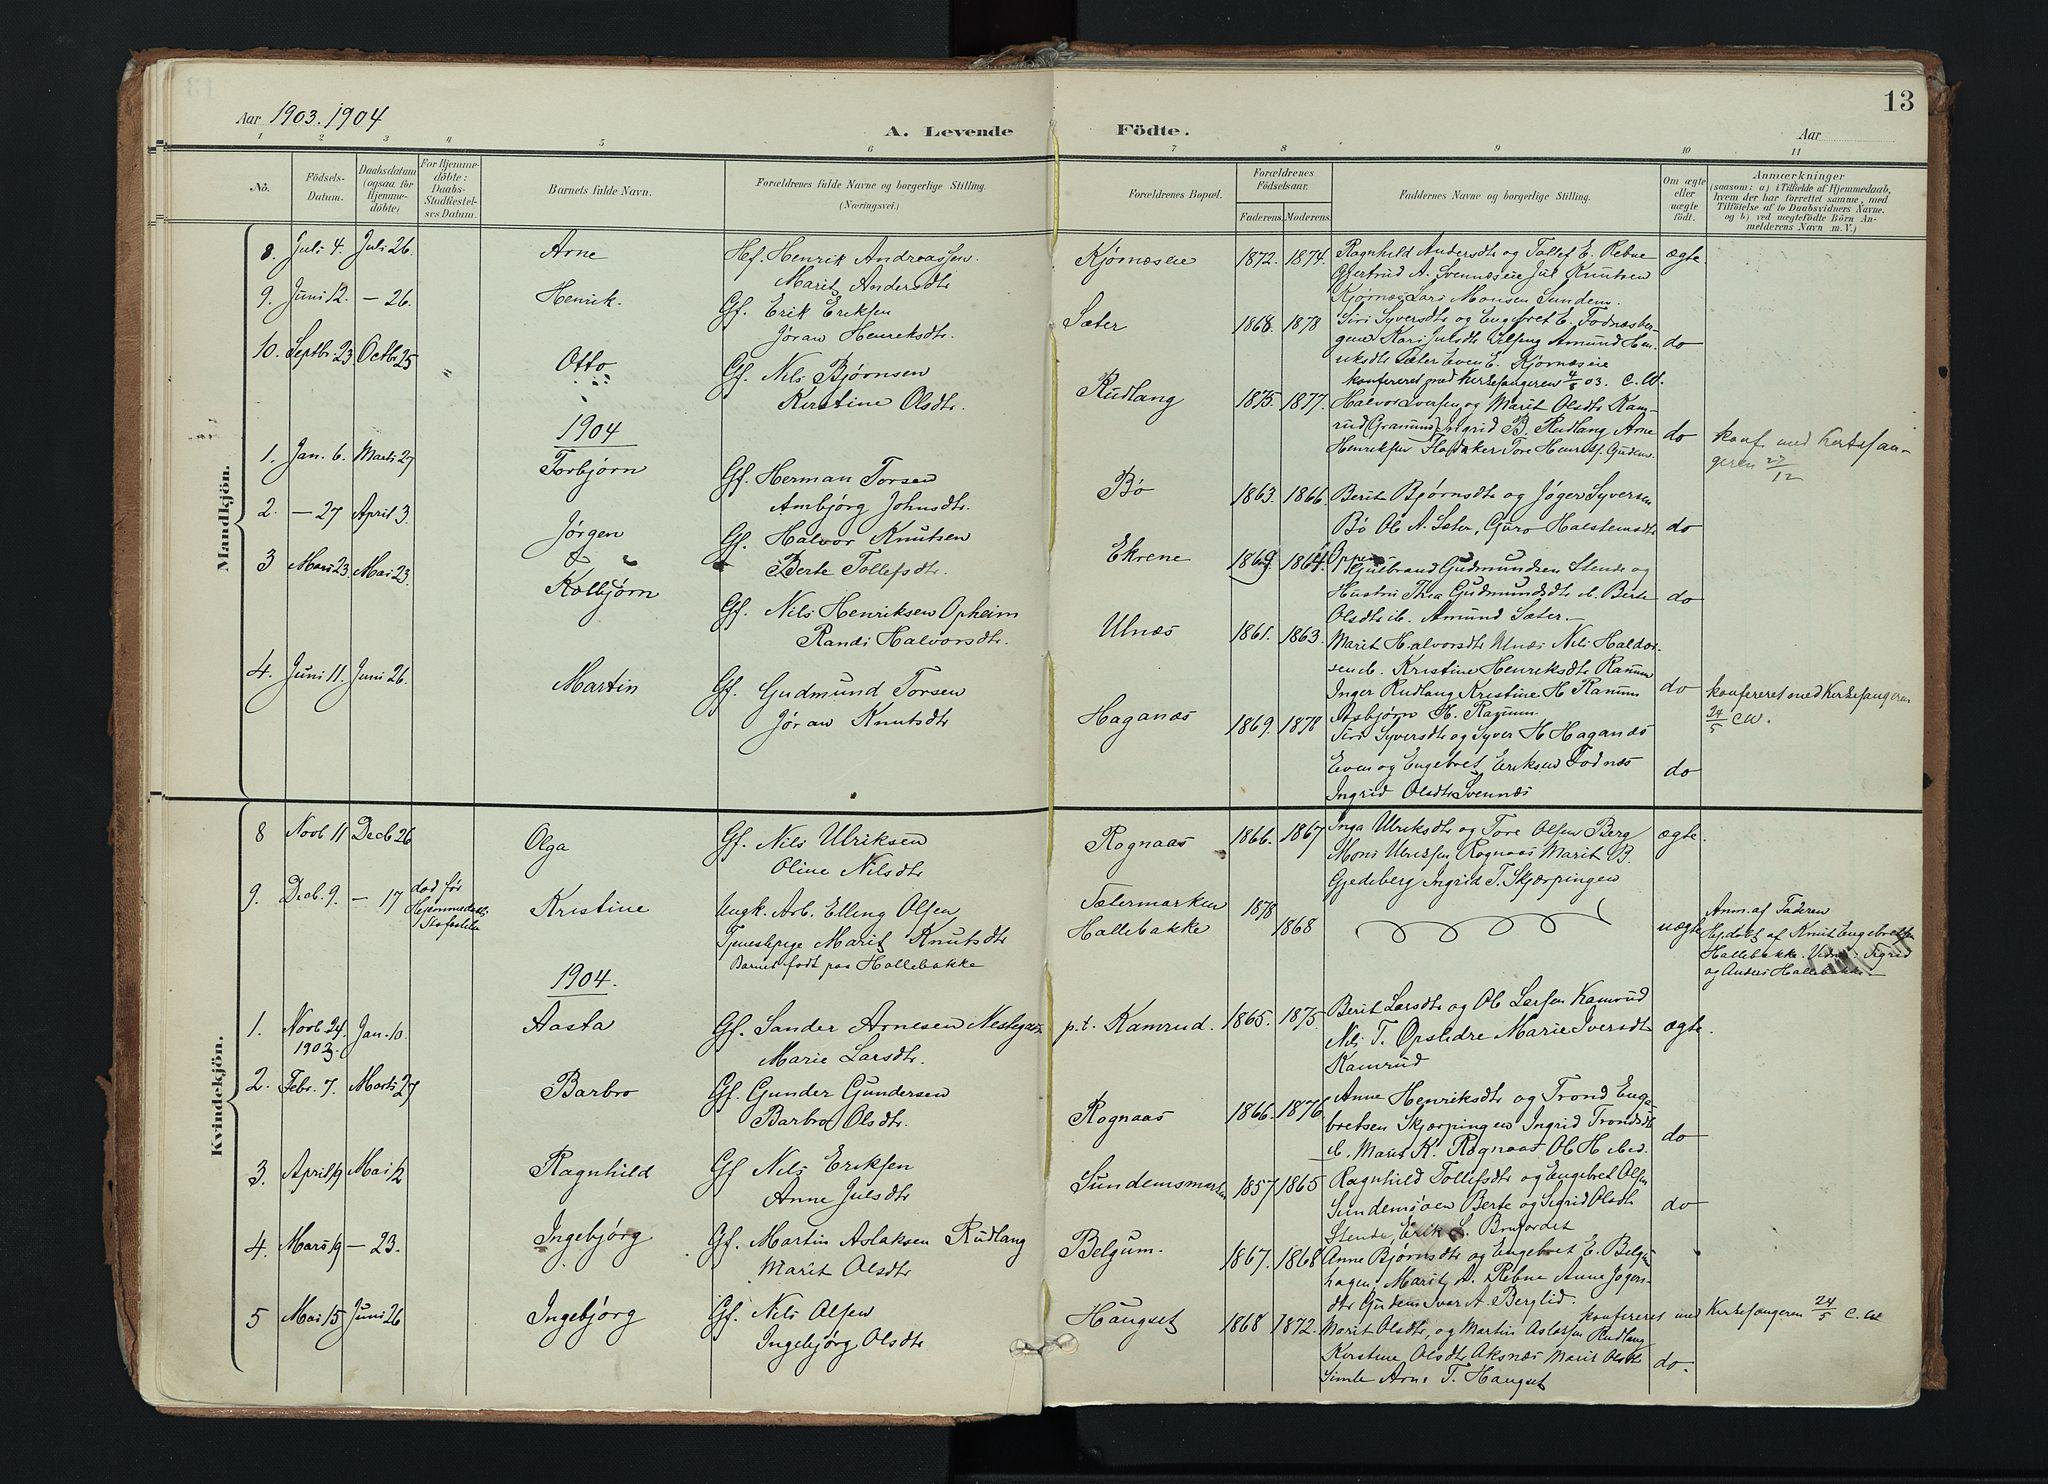 SAH, Nord-Aurdal prestekontor, Ministerialbok nr. 17, 1897-1926, s. 13